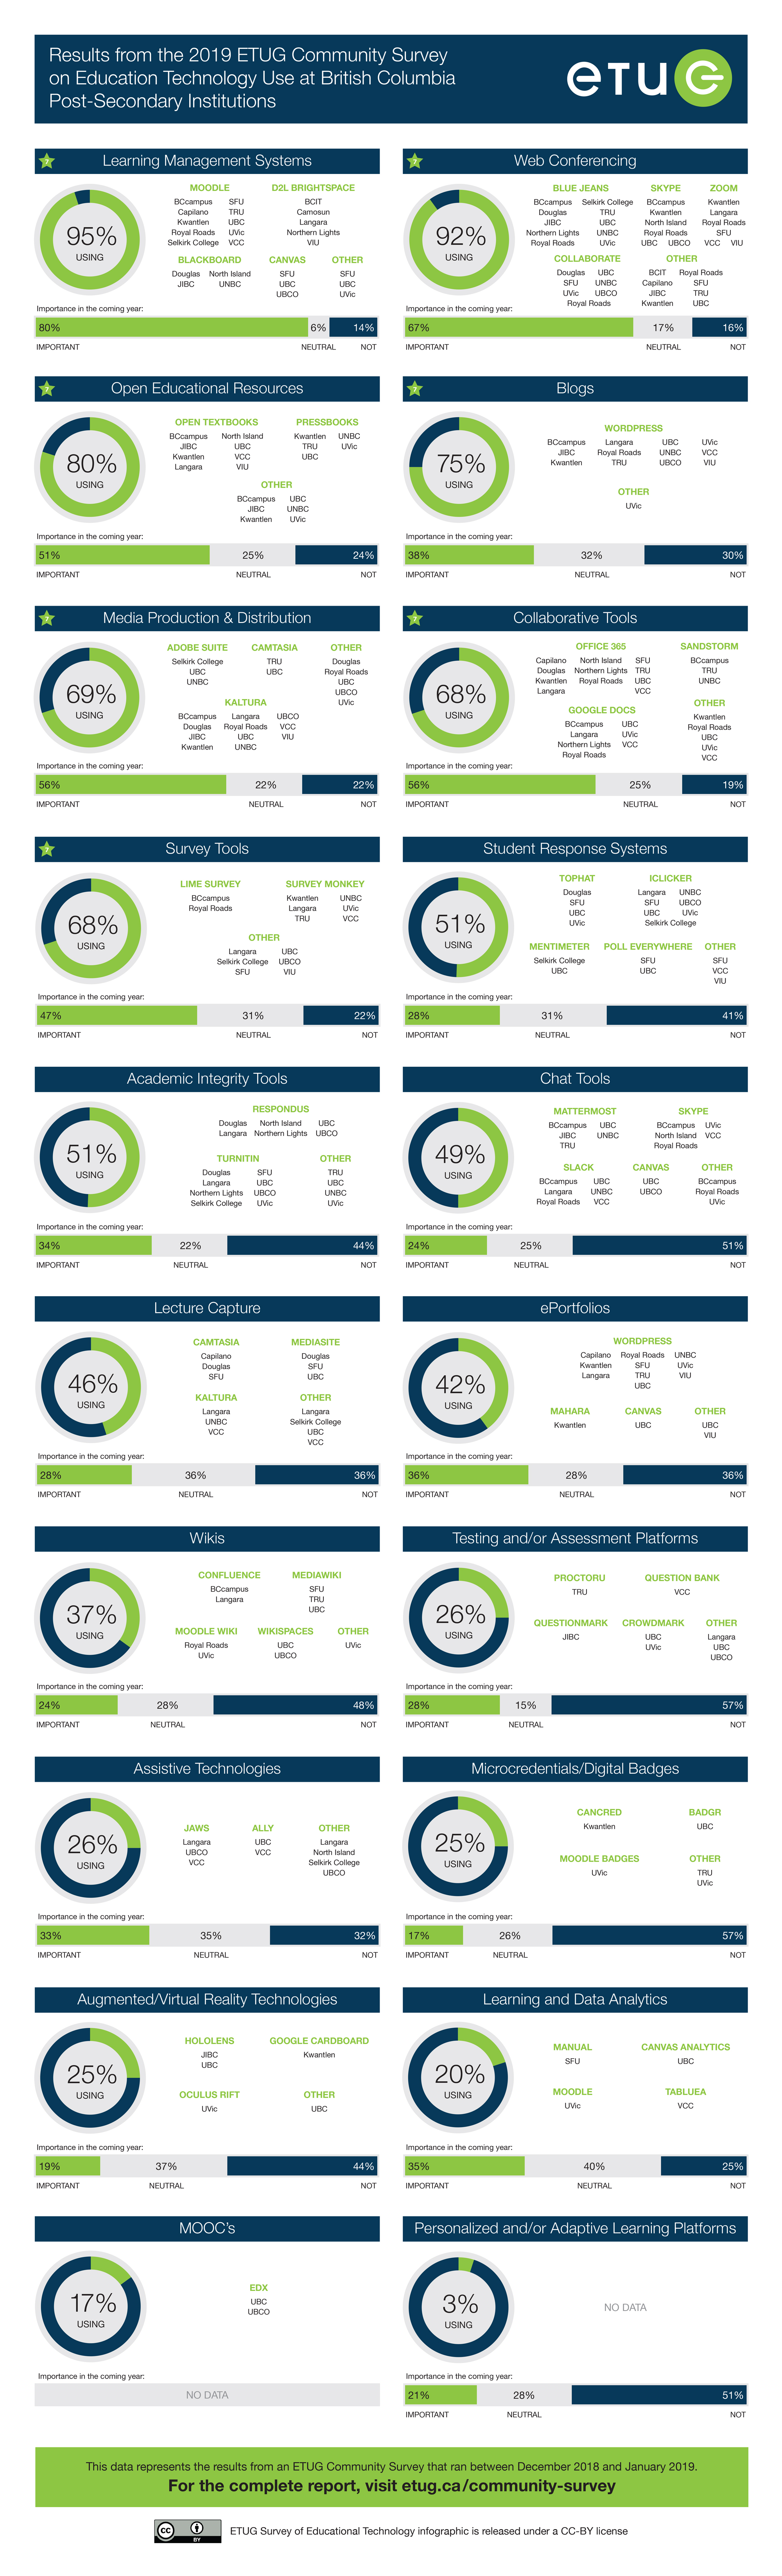 ETUG infographic